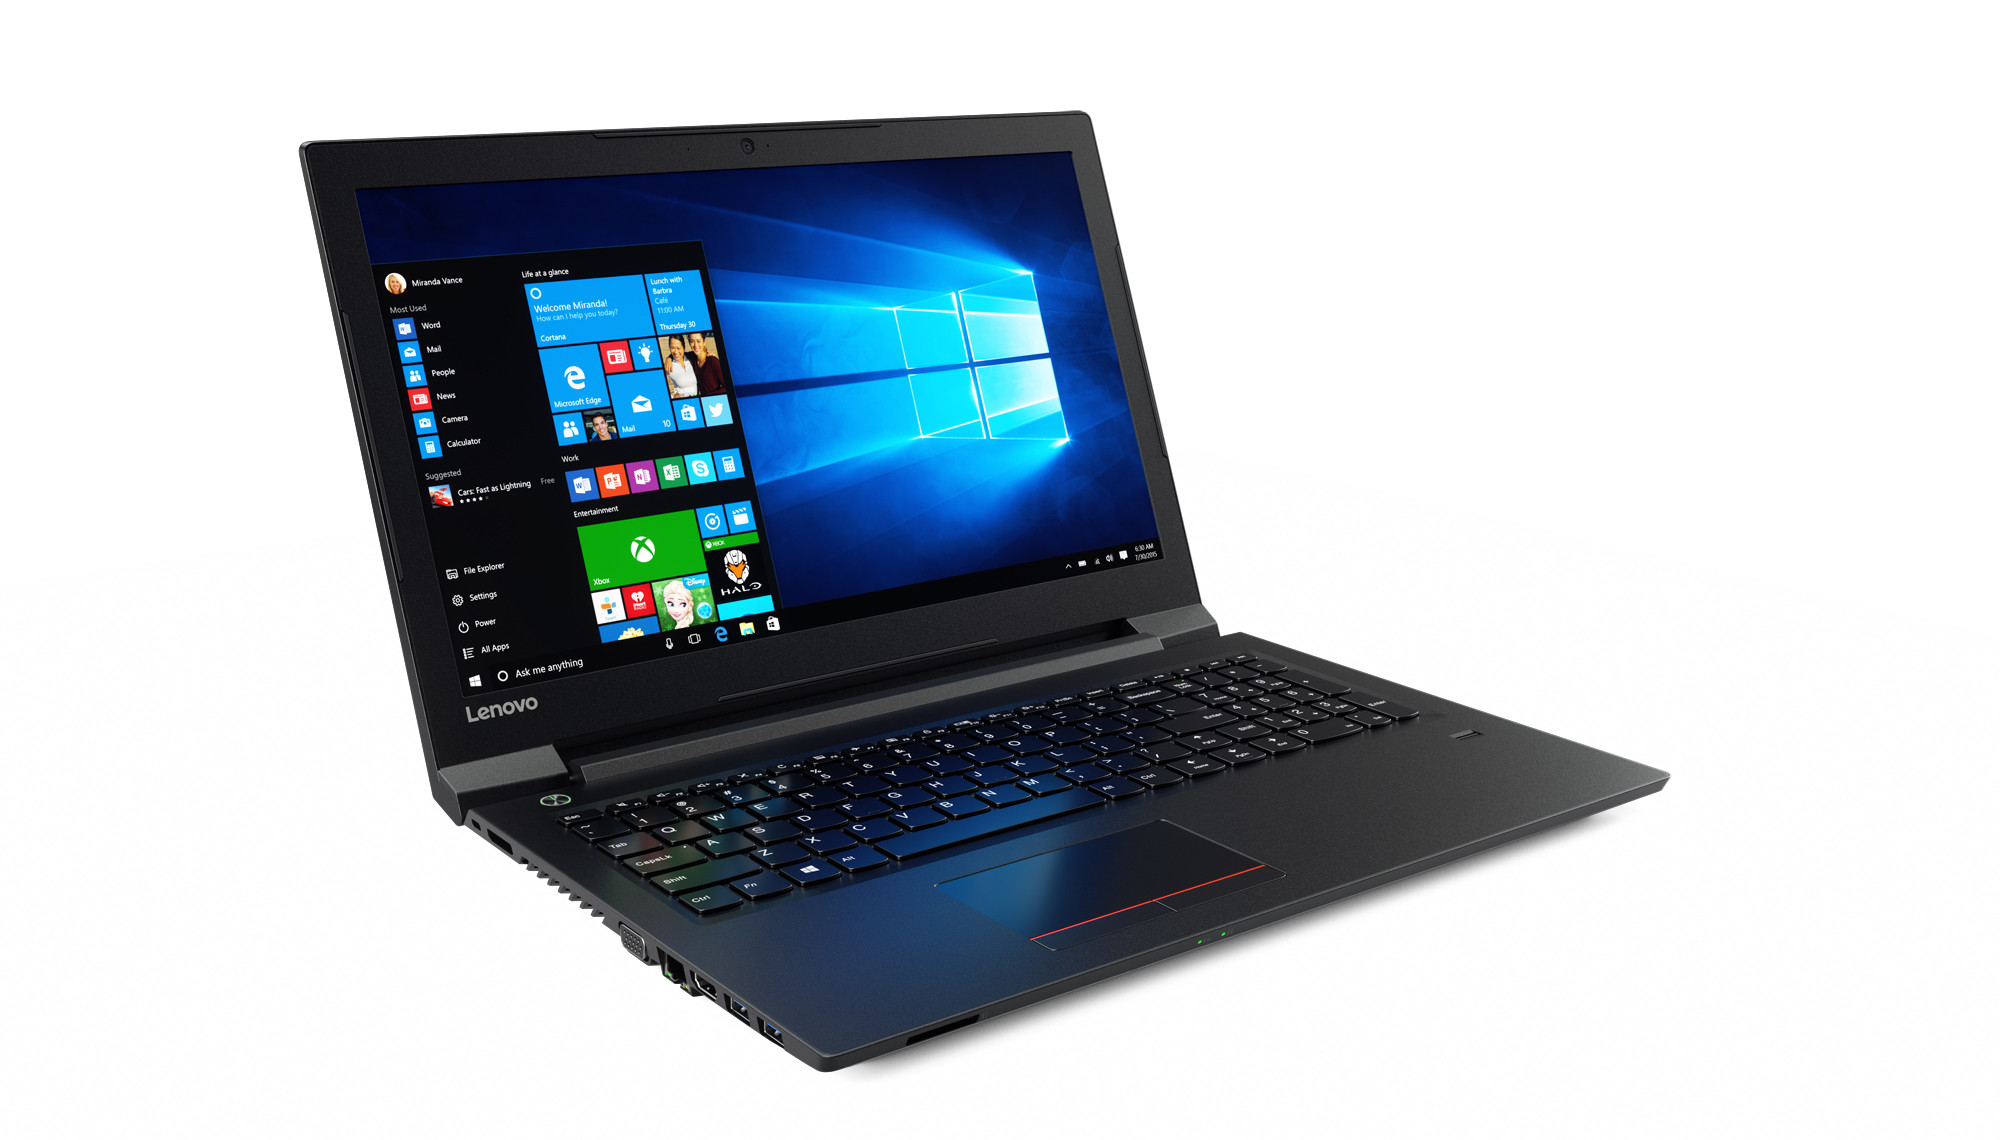 "Lenovo V310-15ISK i5-6200U/6GB/1TB HDD- 5400/DVD-RW/Radeon2GB/15,6""FHD matný/Win10"